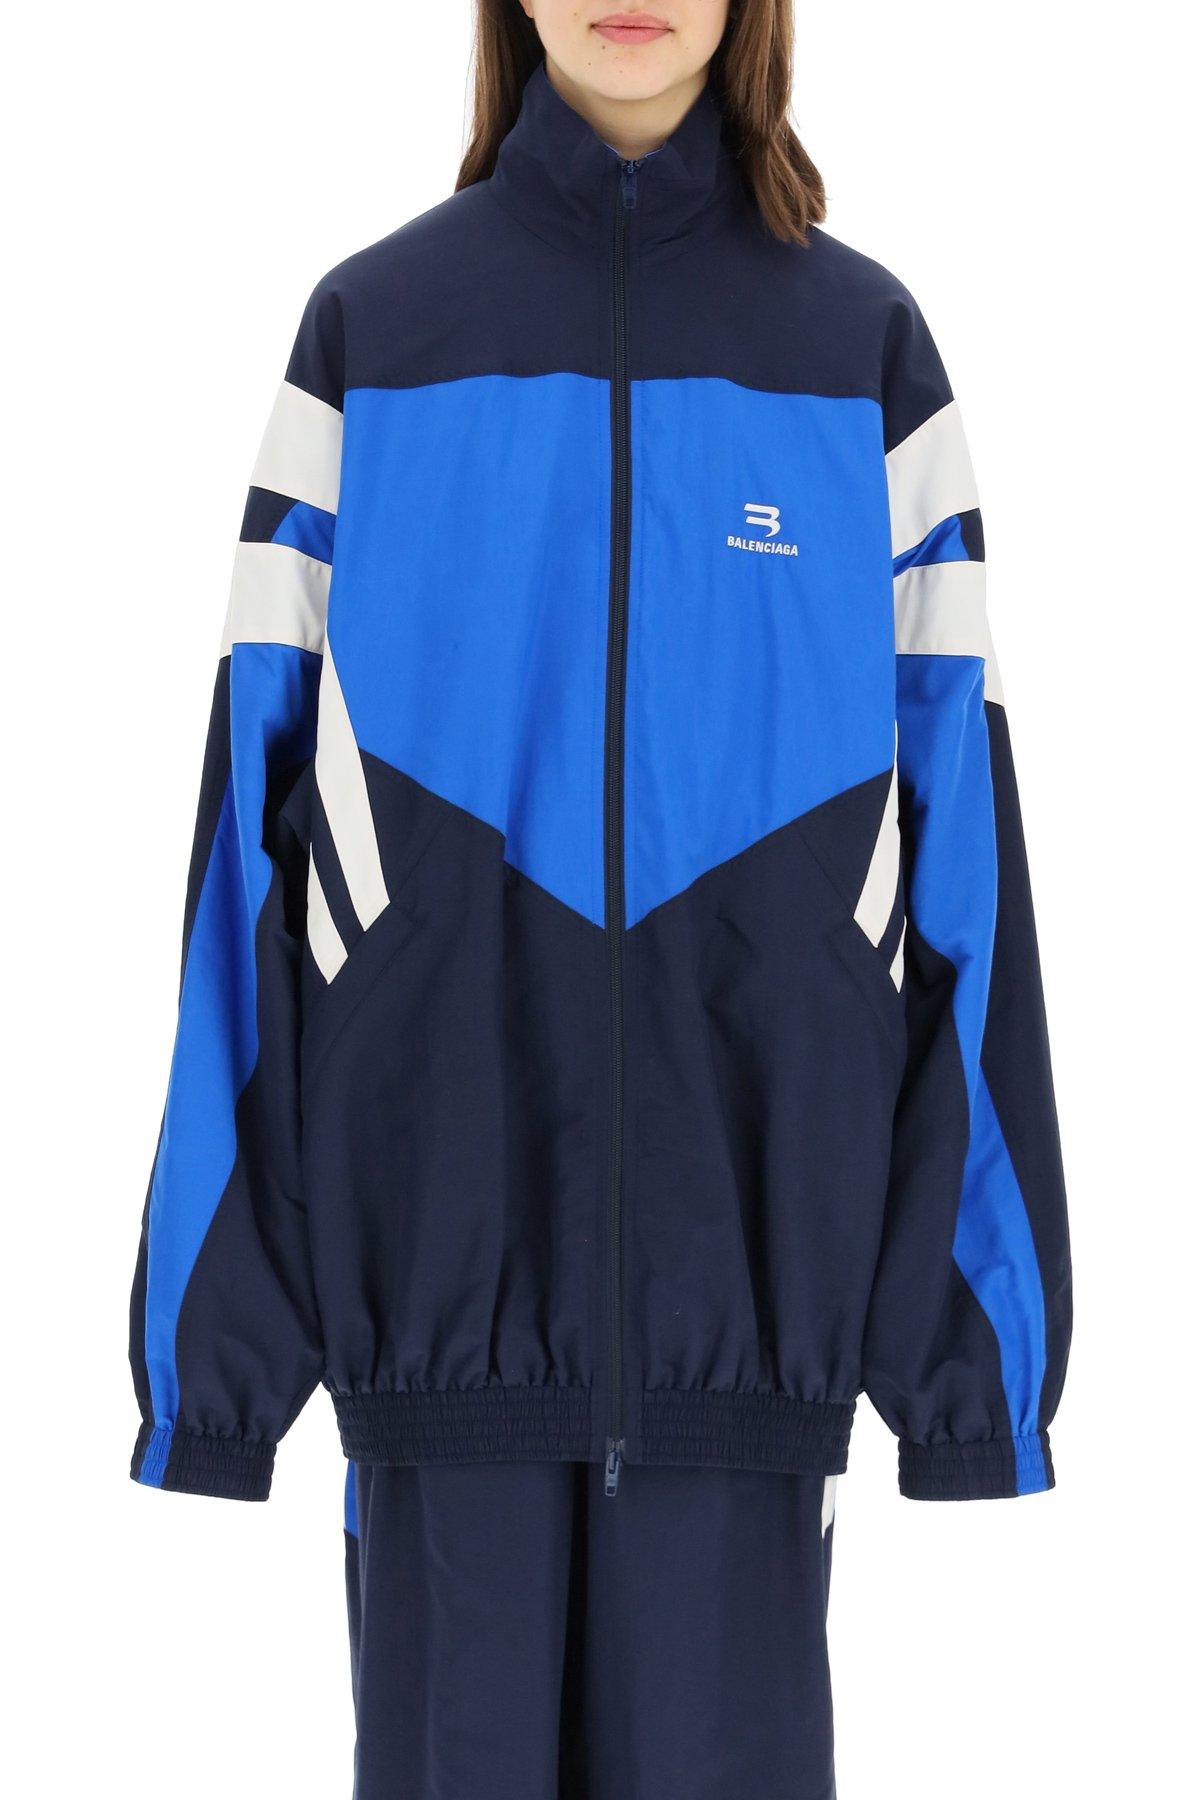 Balenciaga giacca tracksuit in nylon